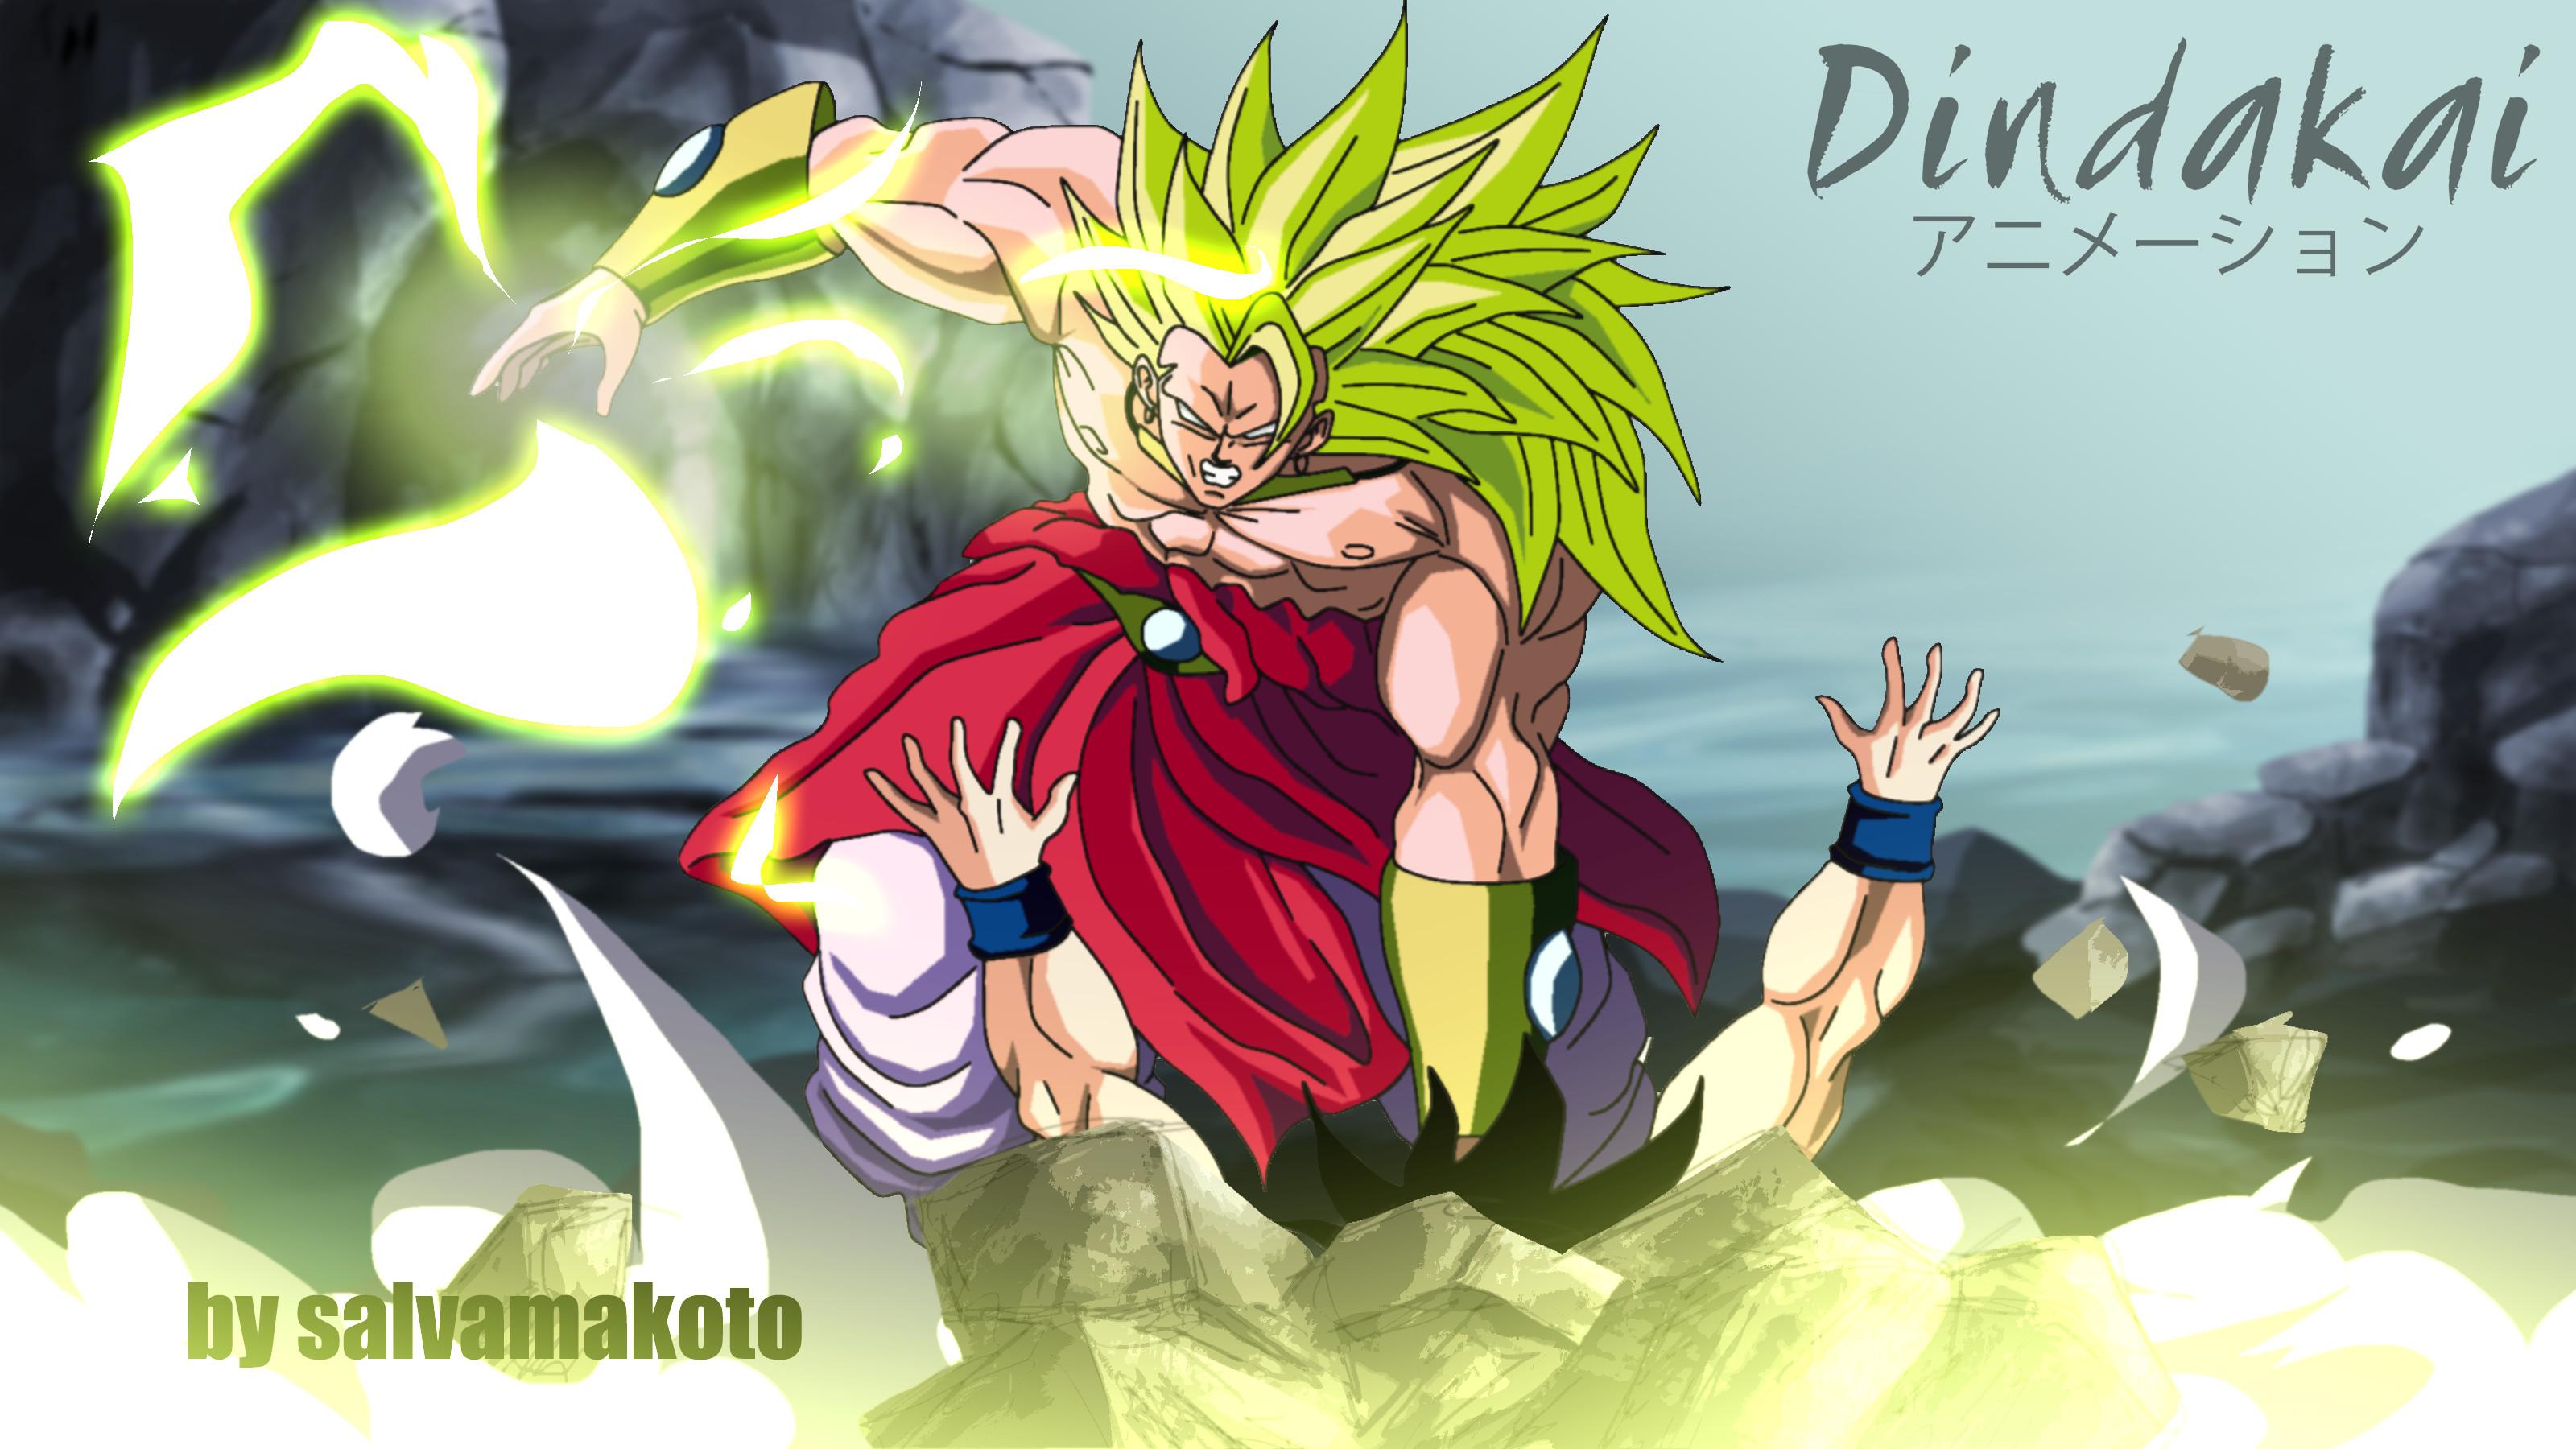 Broly ss3 vs Goku by dindakai on DeviantArt